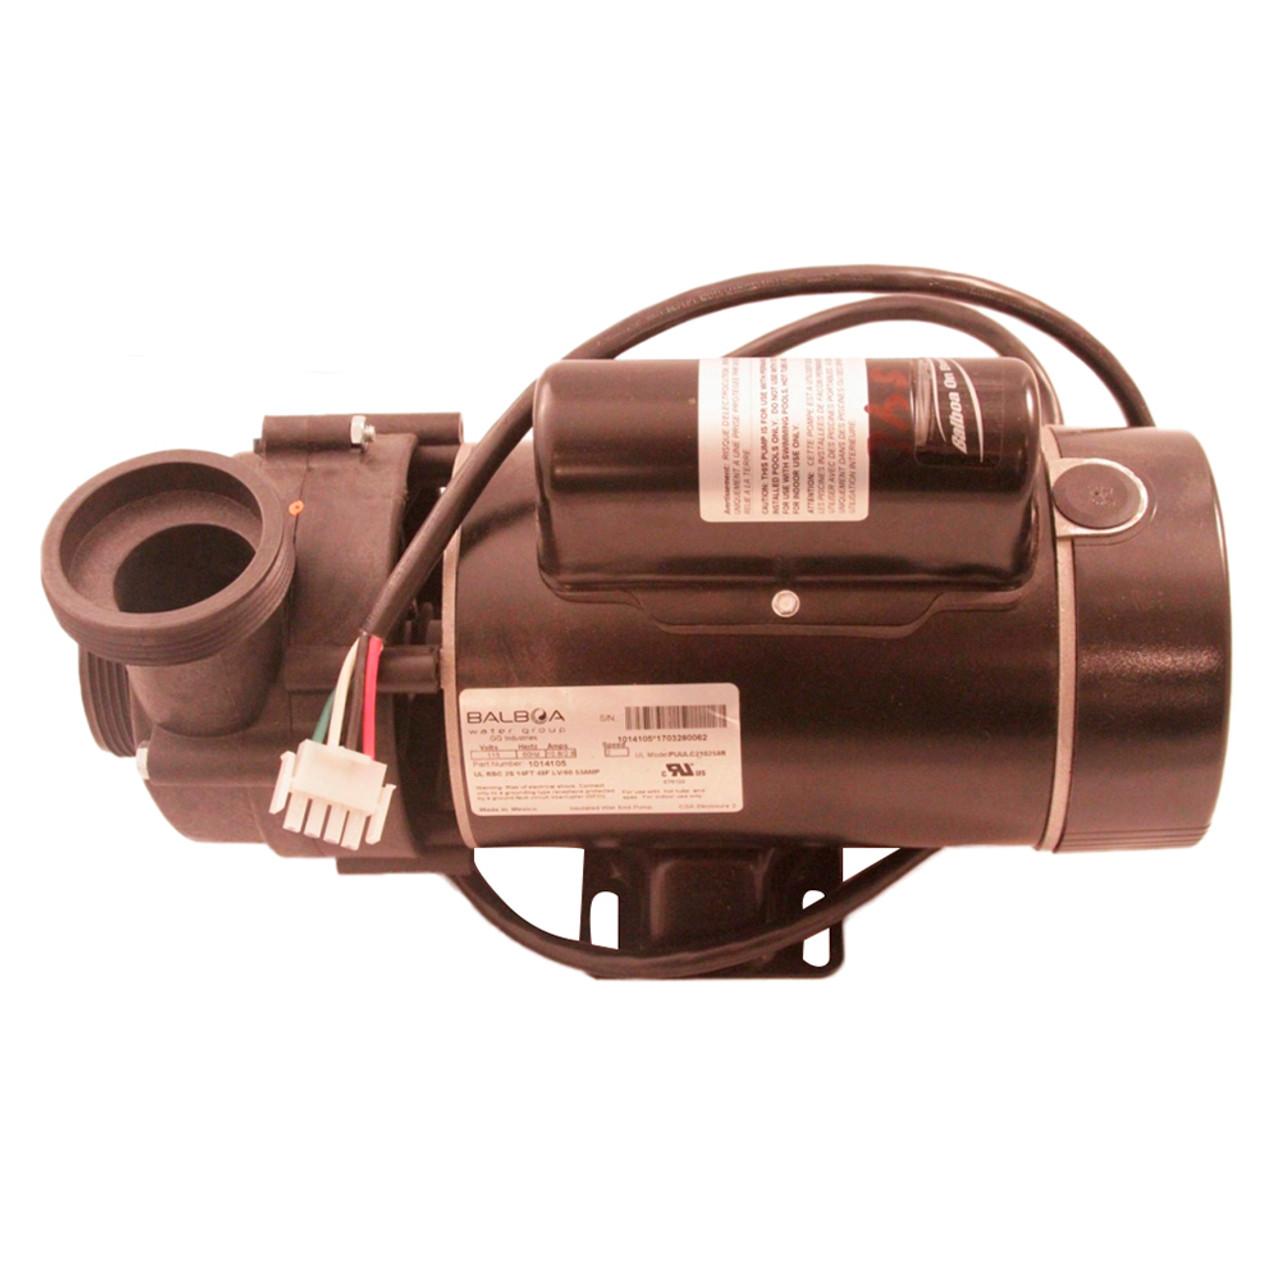 Master Spa - X320540 - Spa Pump - 10.8 Amp, 2 Speed 120 Volt Pump